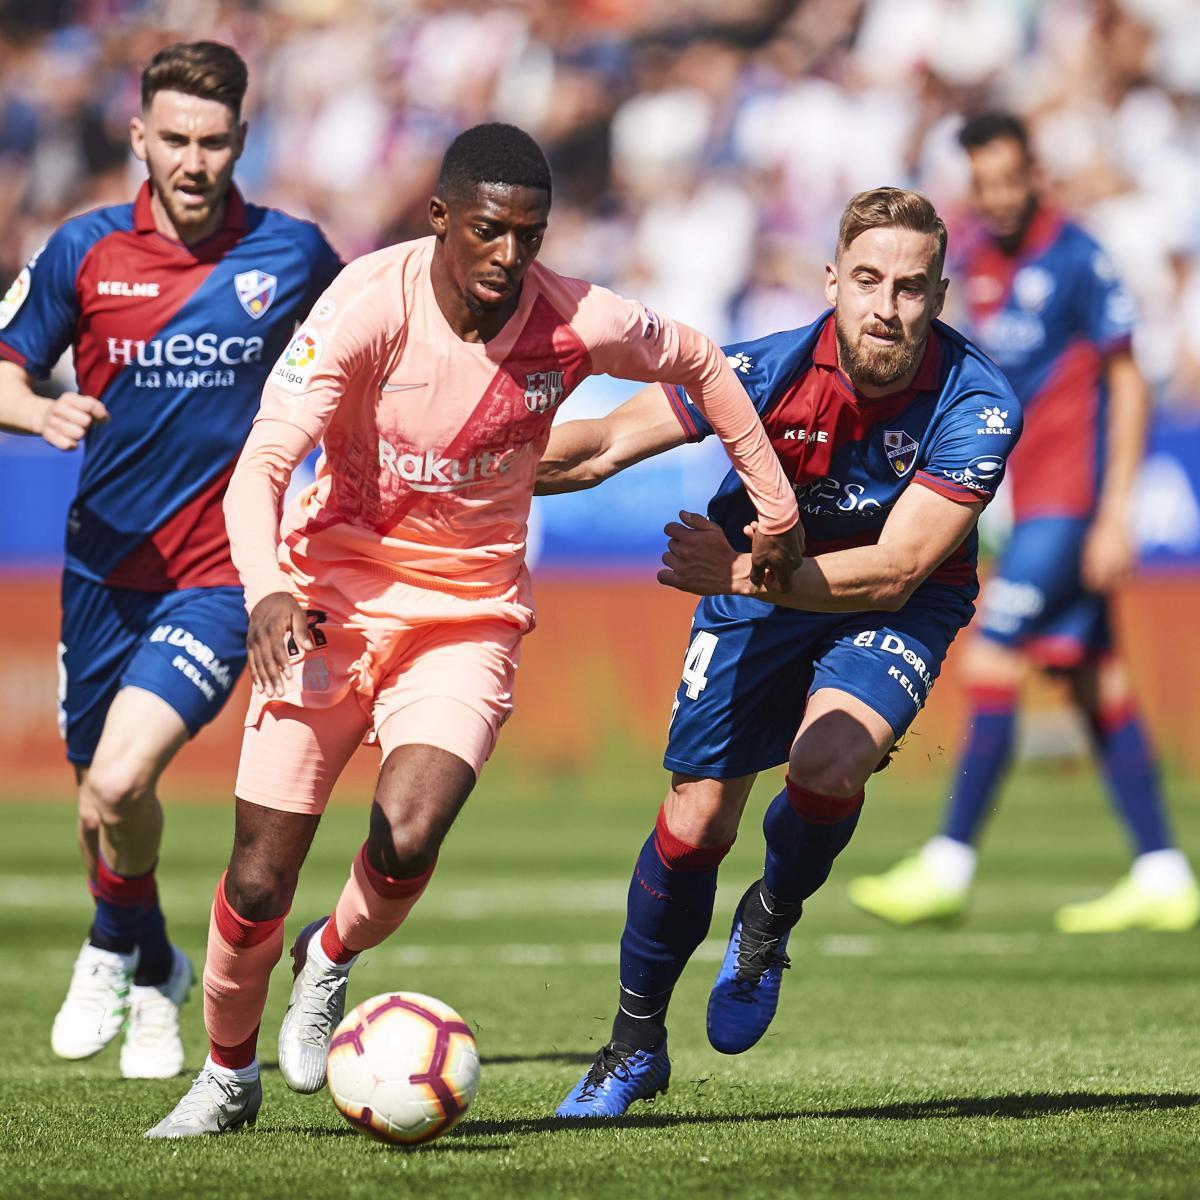 Celta Vigo Vs Barcelona Live Commentary: Barcelona Struggle To Scoreless Draw Vs. Last-Place Huesca